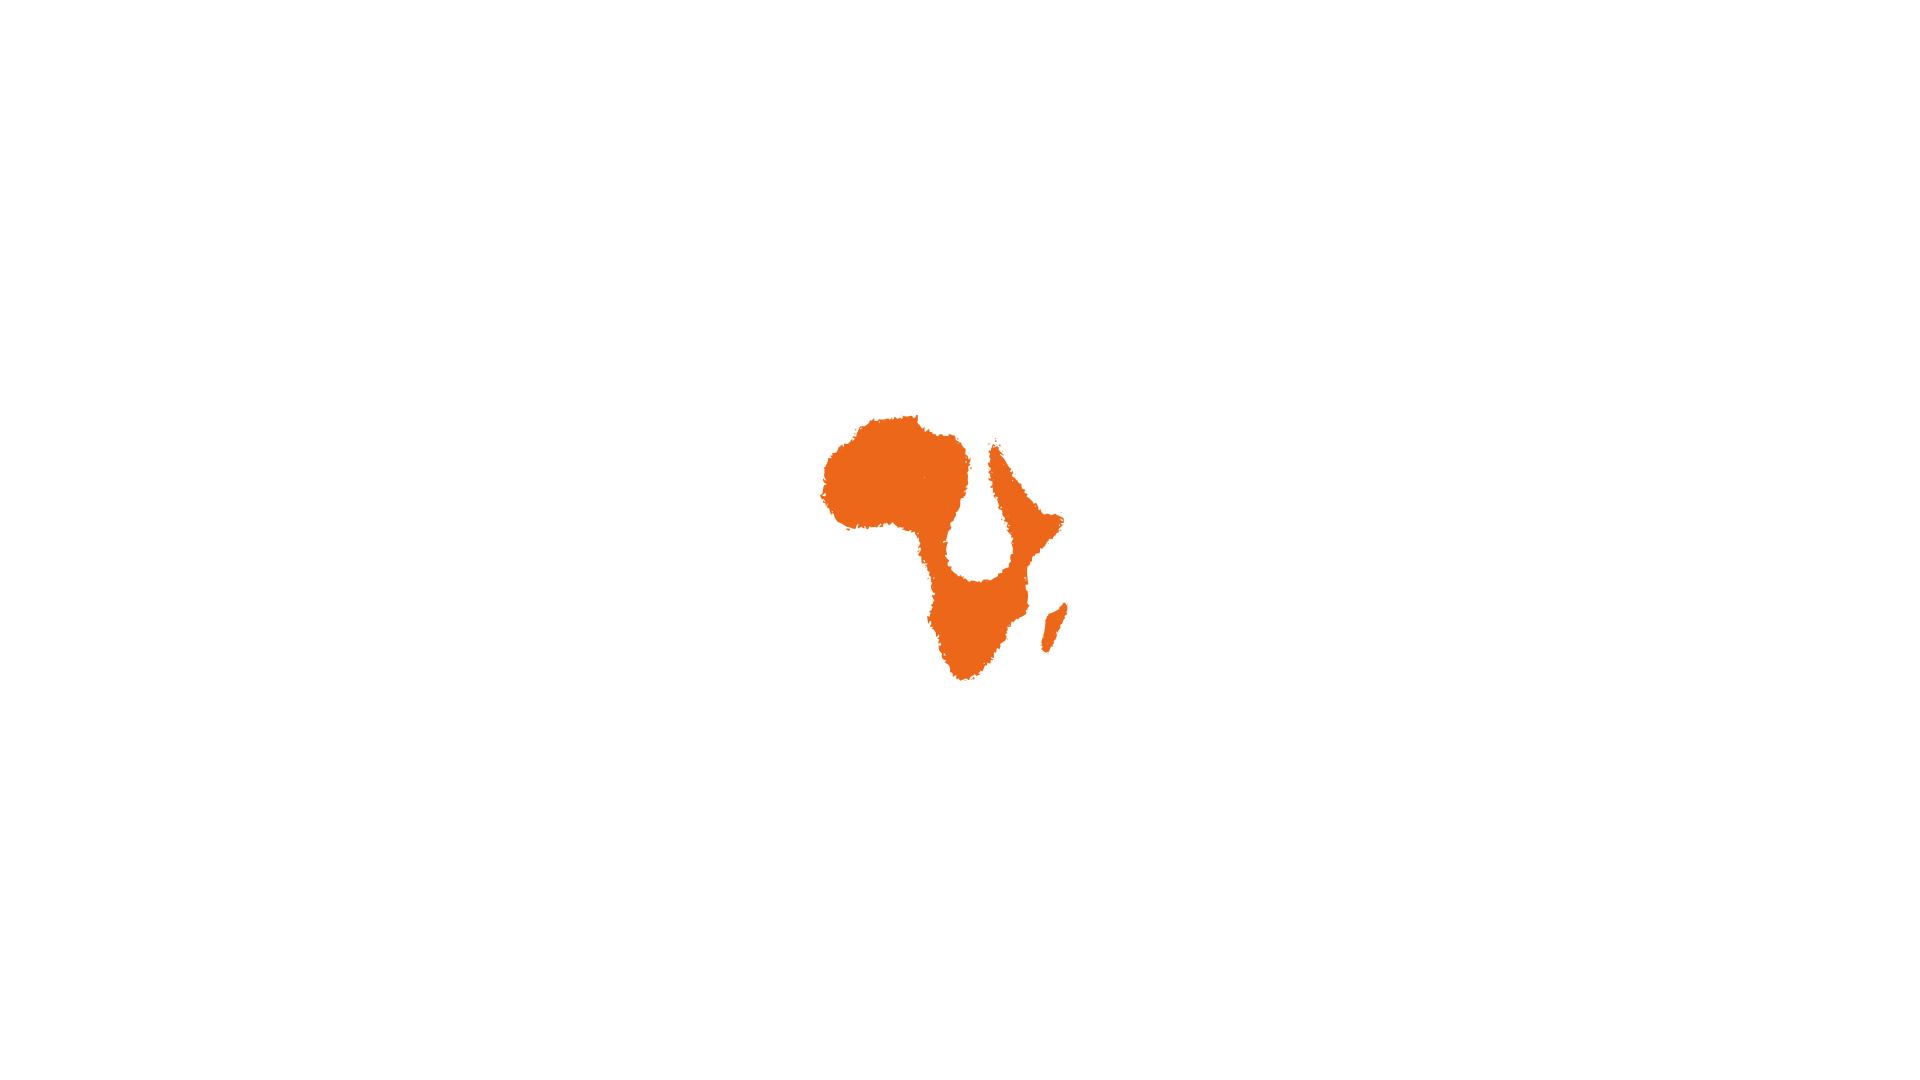 logo uppy africa / %sitename